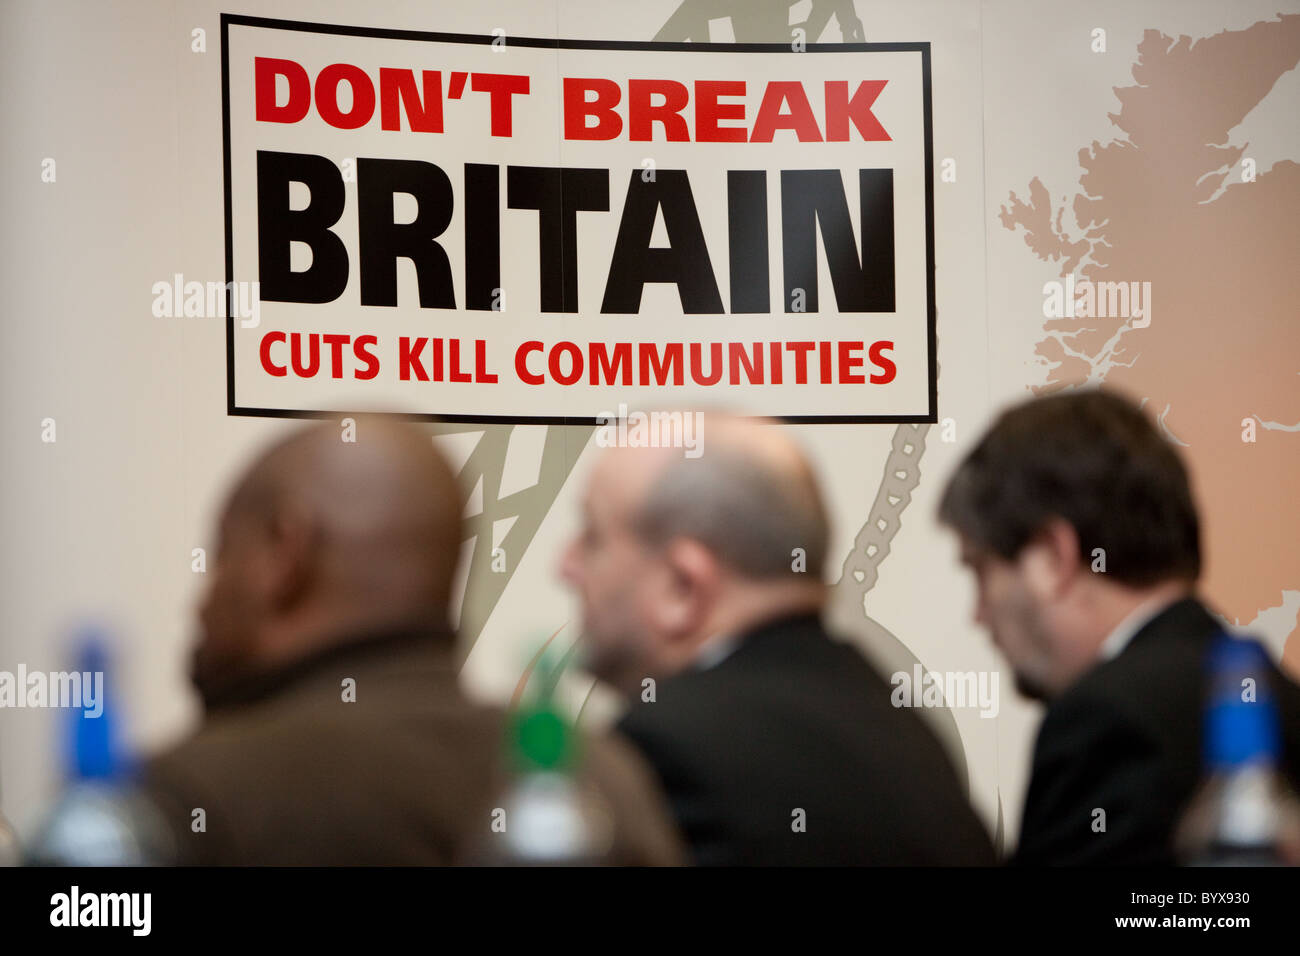 Cuts kill communities sign Stock Photo